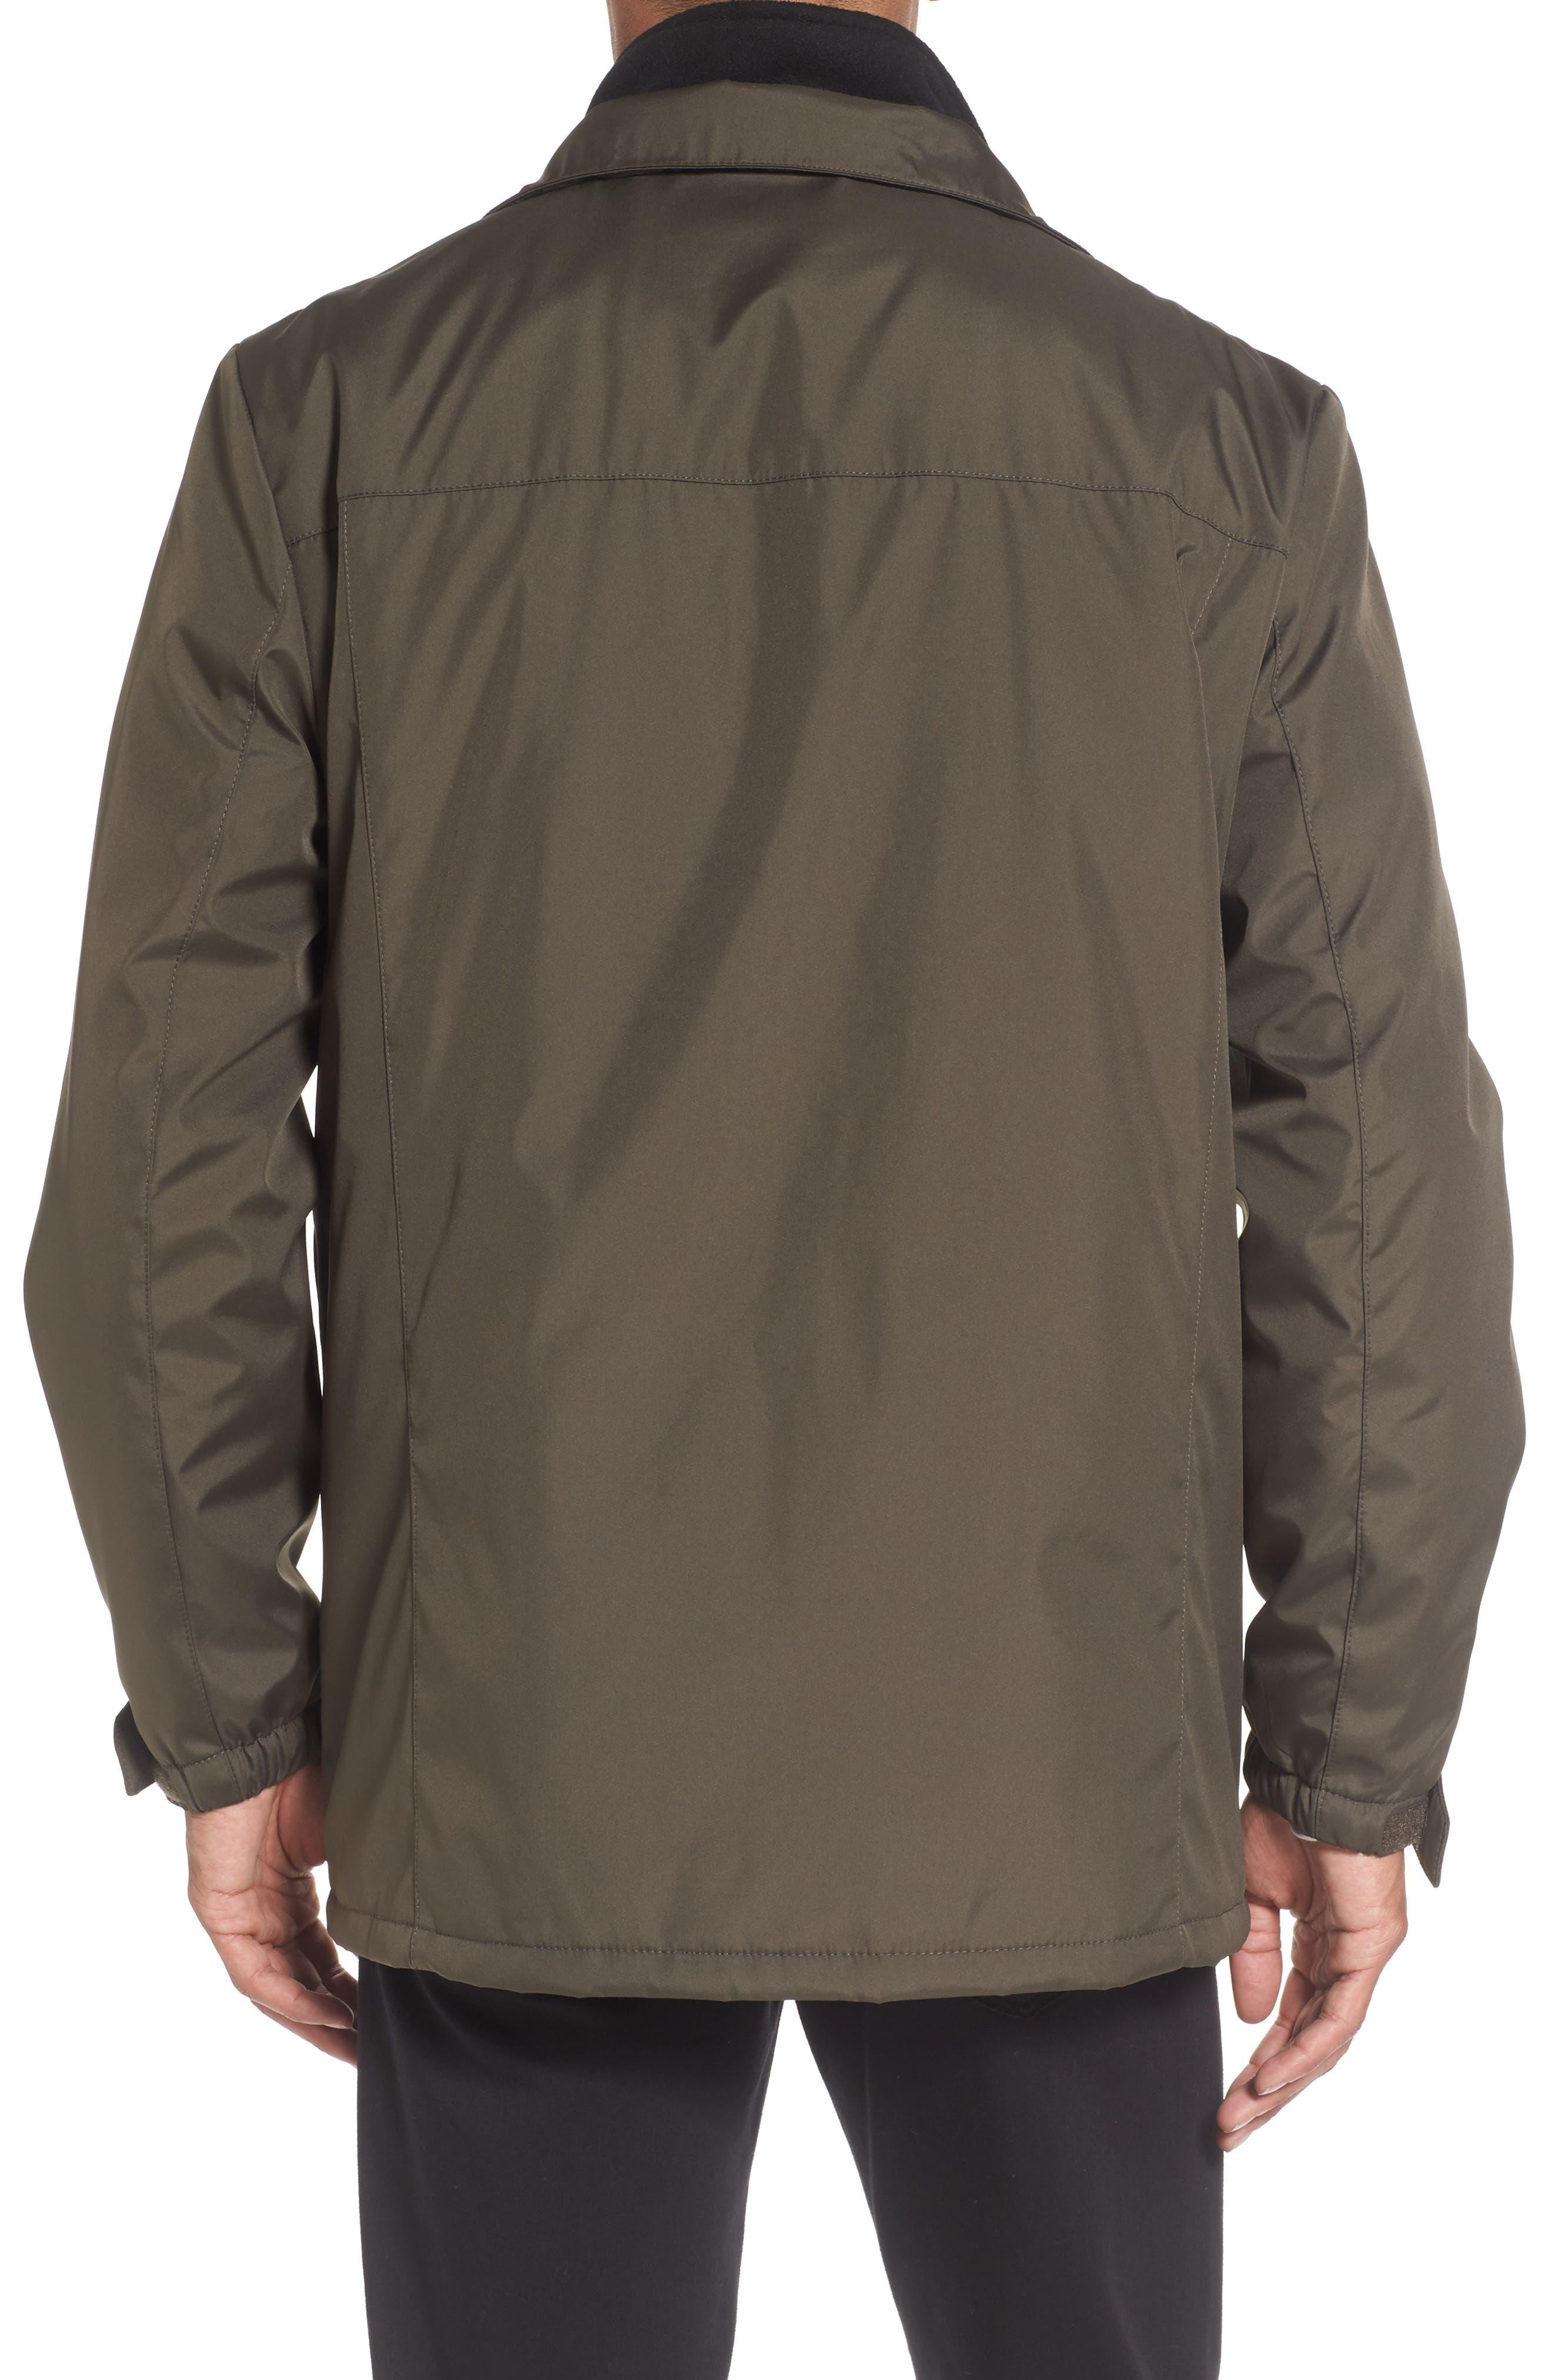 Hooded Jacket with Inset Fleece Bib,                             Alternate thumbnail 15, color,